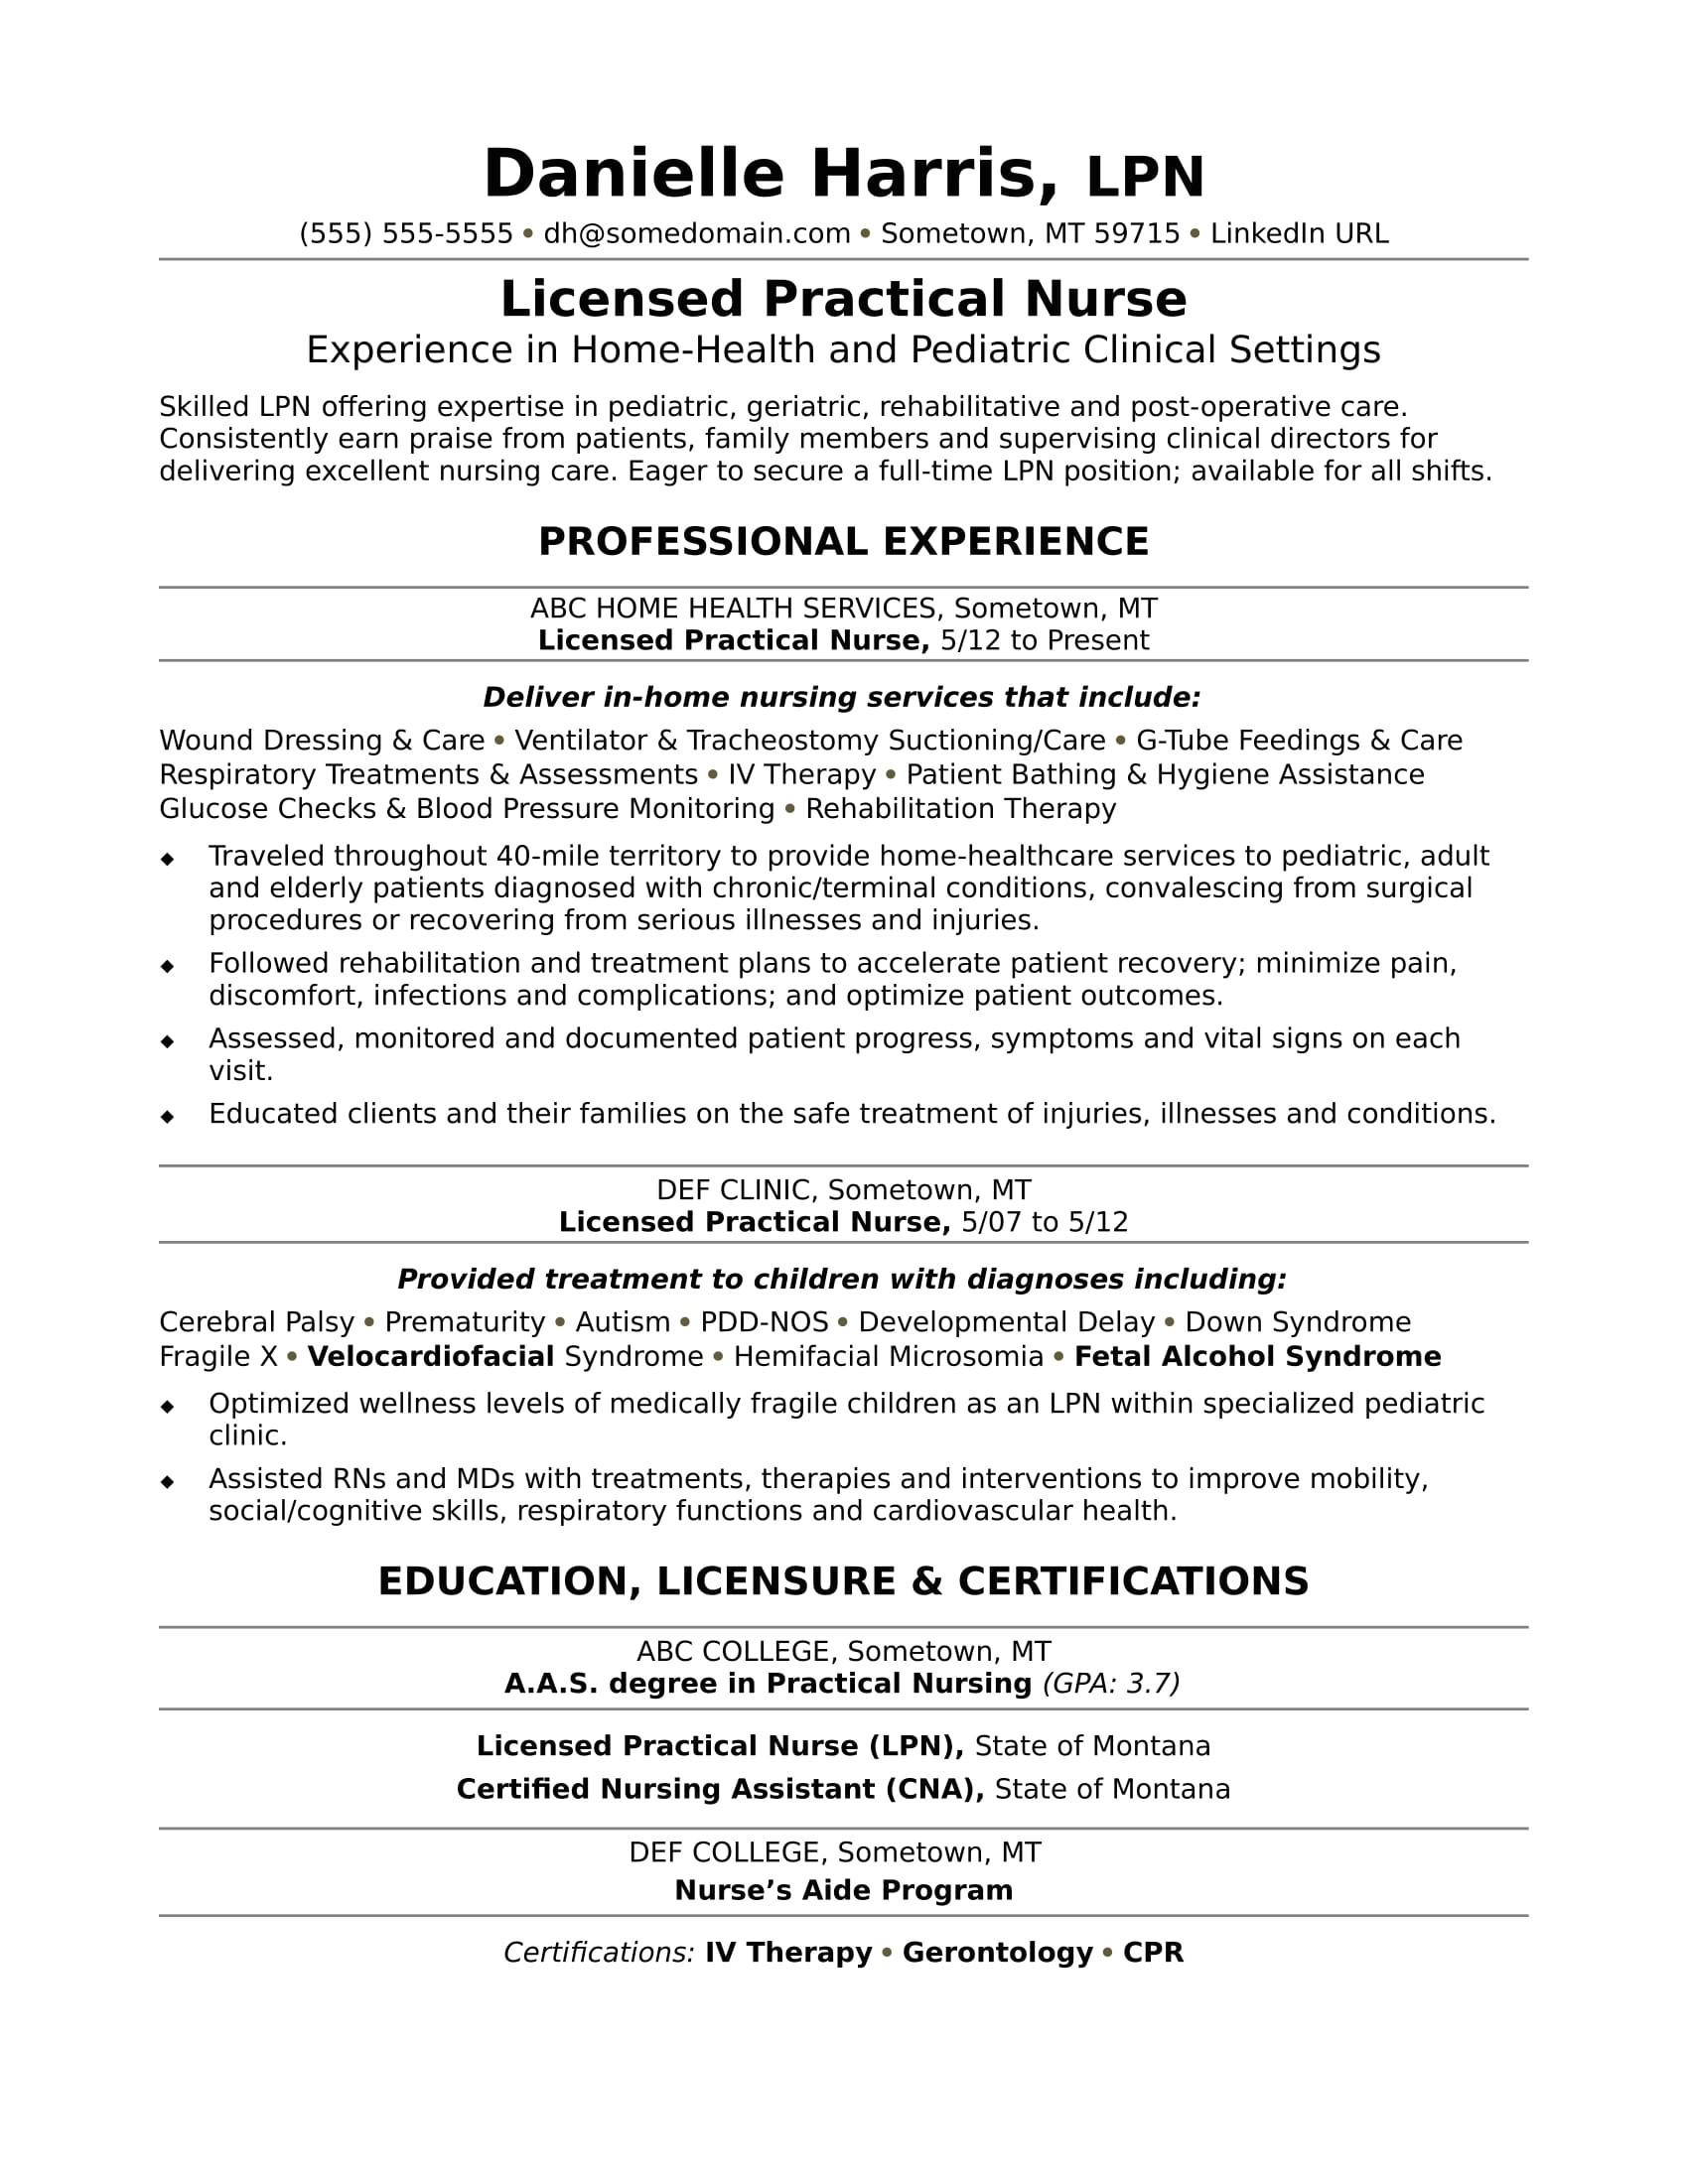 Free Resume Templates for Lpn Nurses Licensed Practical Nurse Resume Sample Monster Com